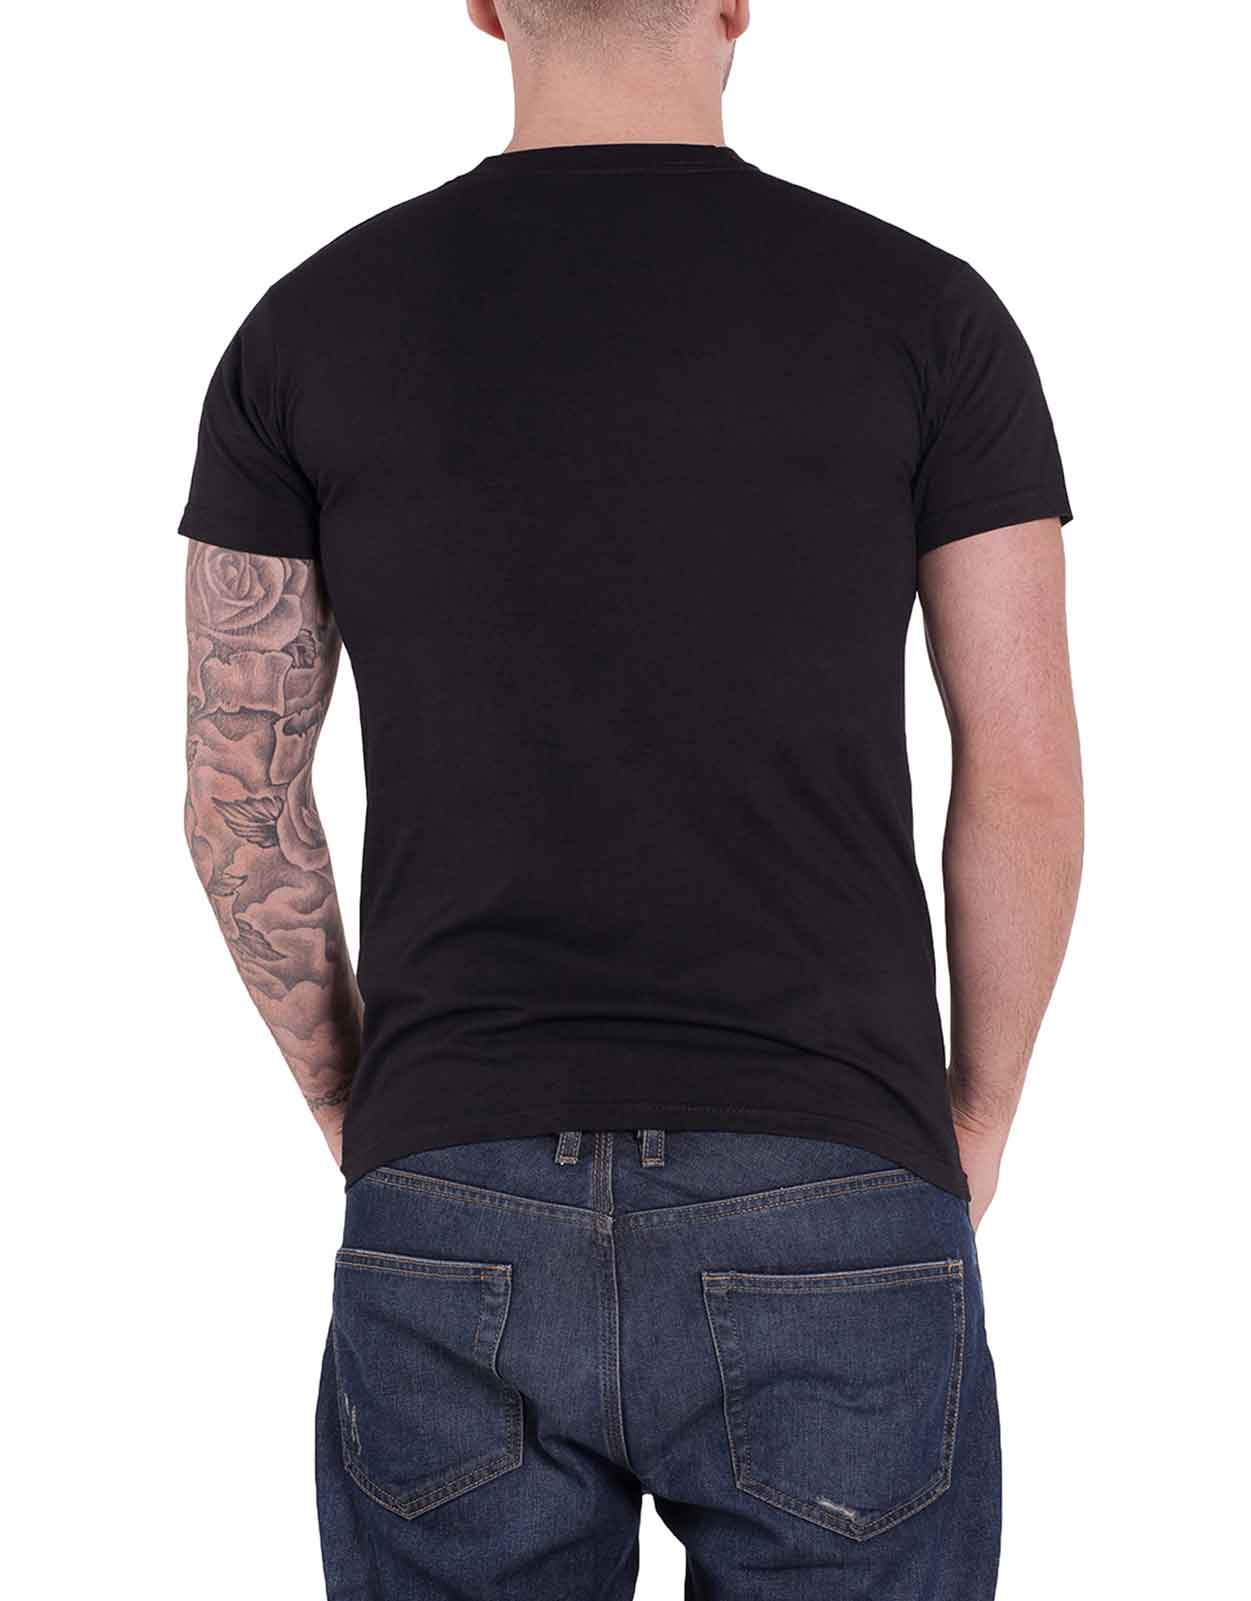 Official-Motley-Crue-T-Shirt-Shout-at-the-Devil-The-Dirt-Tour-Band-Logo-Mens thumbnail 39